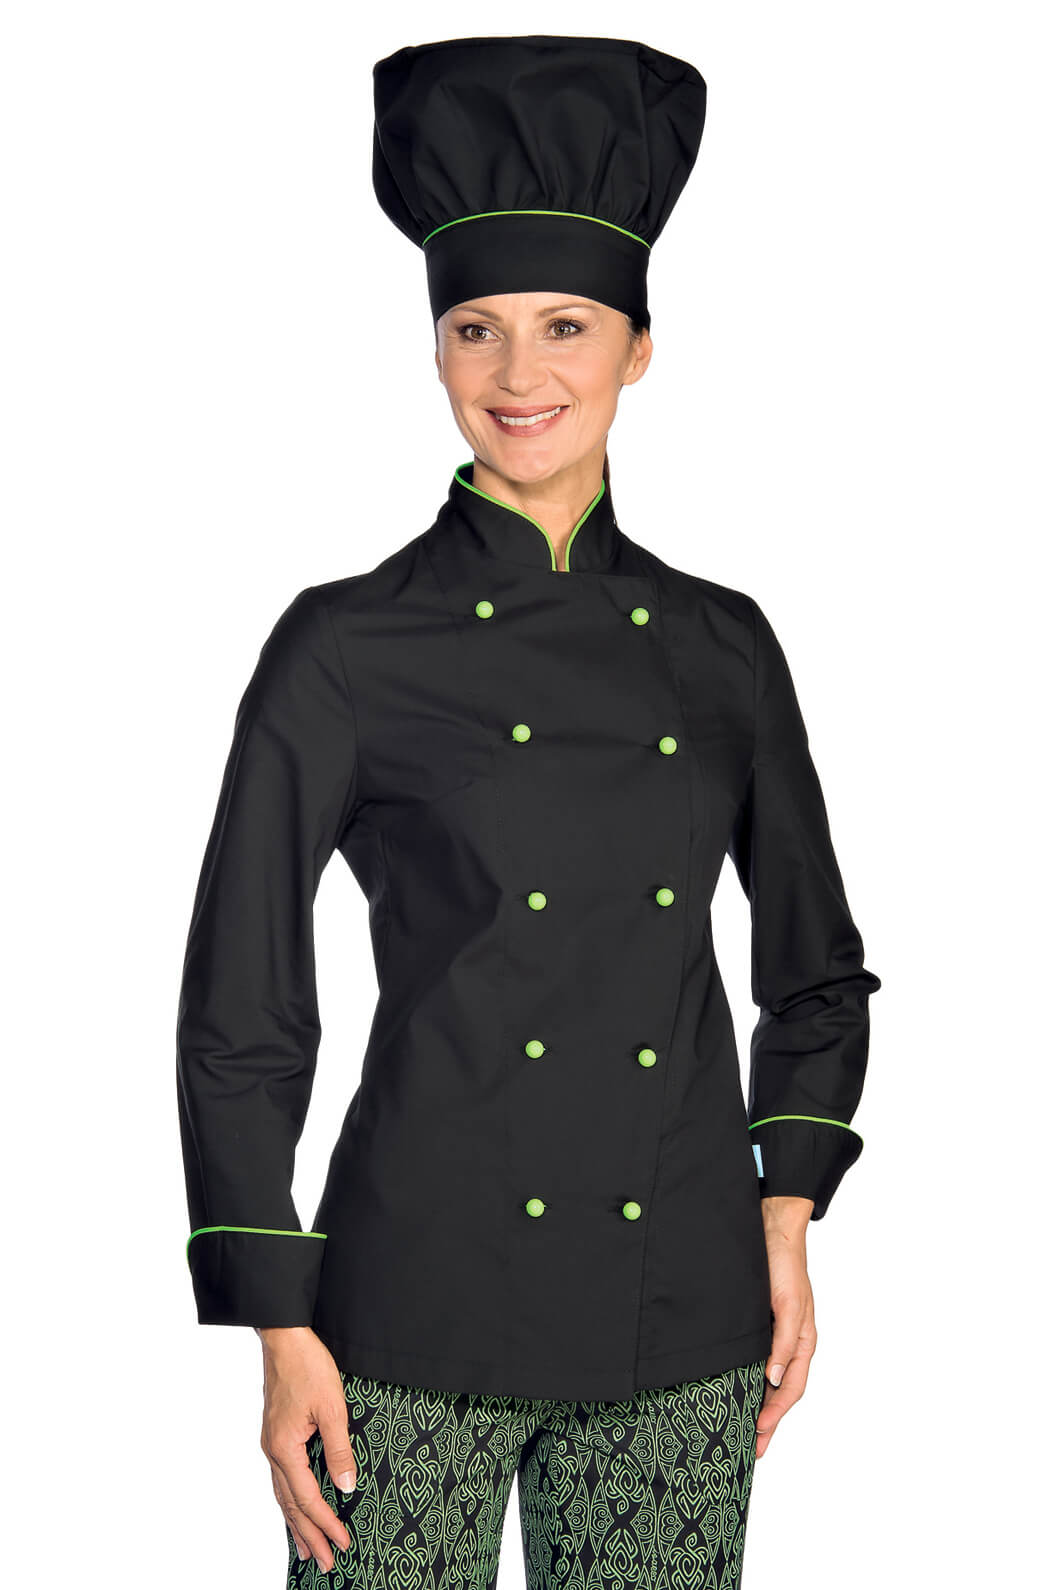 veste de cuisine femme ultra l g re noir liser vert pomme vestes de cuisine femme. Black Bedroom Furniture Sets. Home Design Ideas